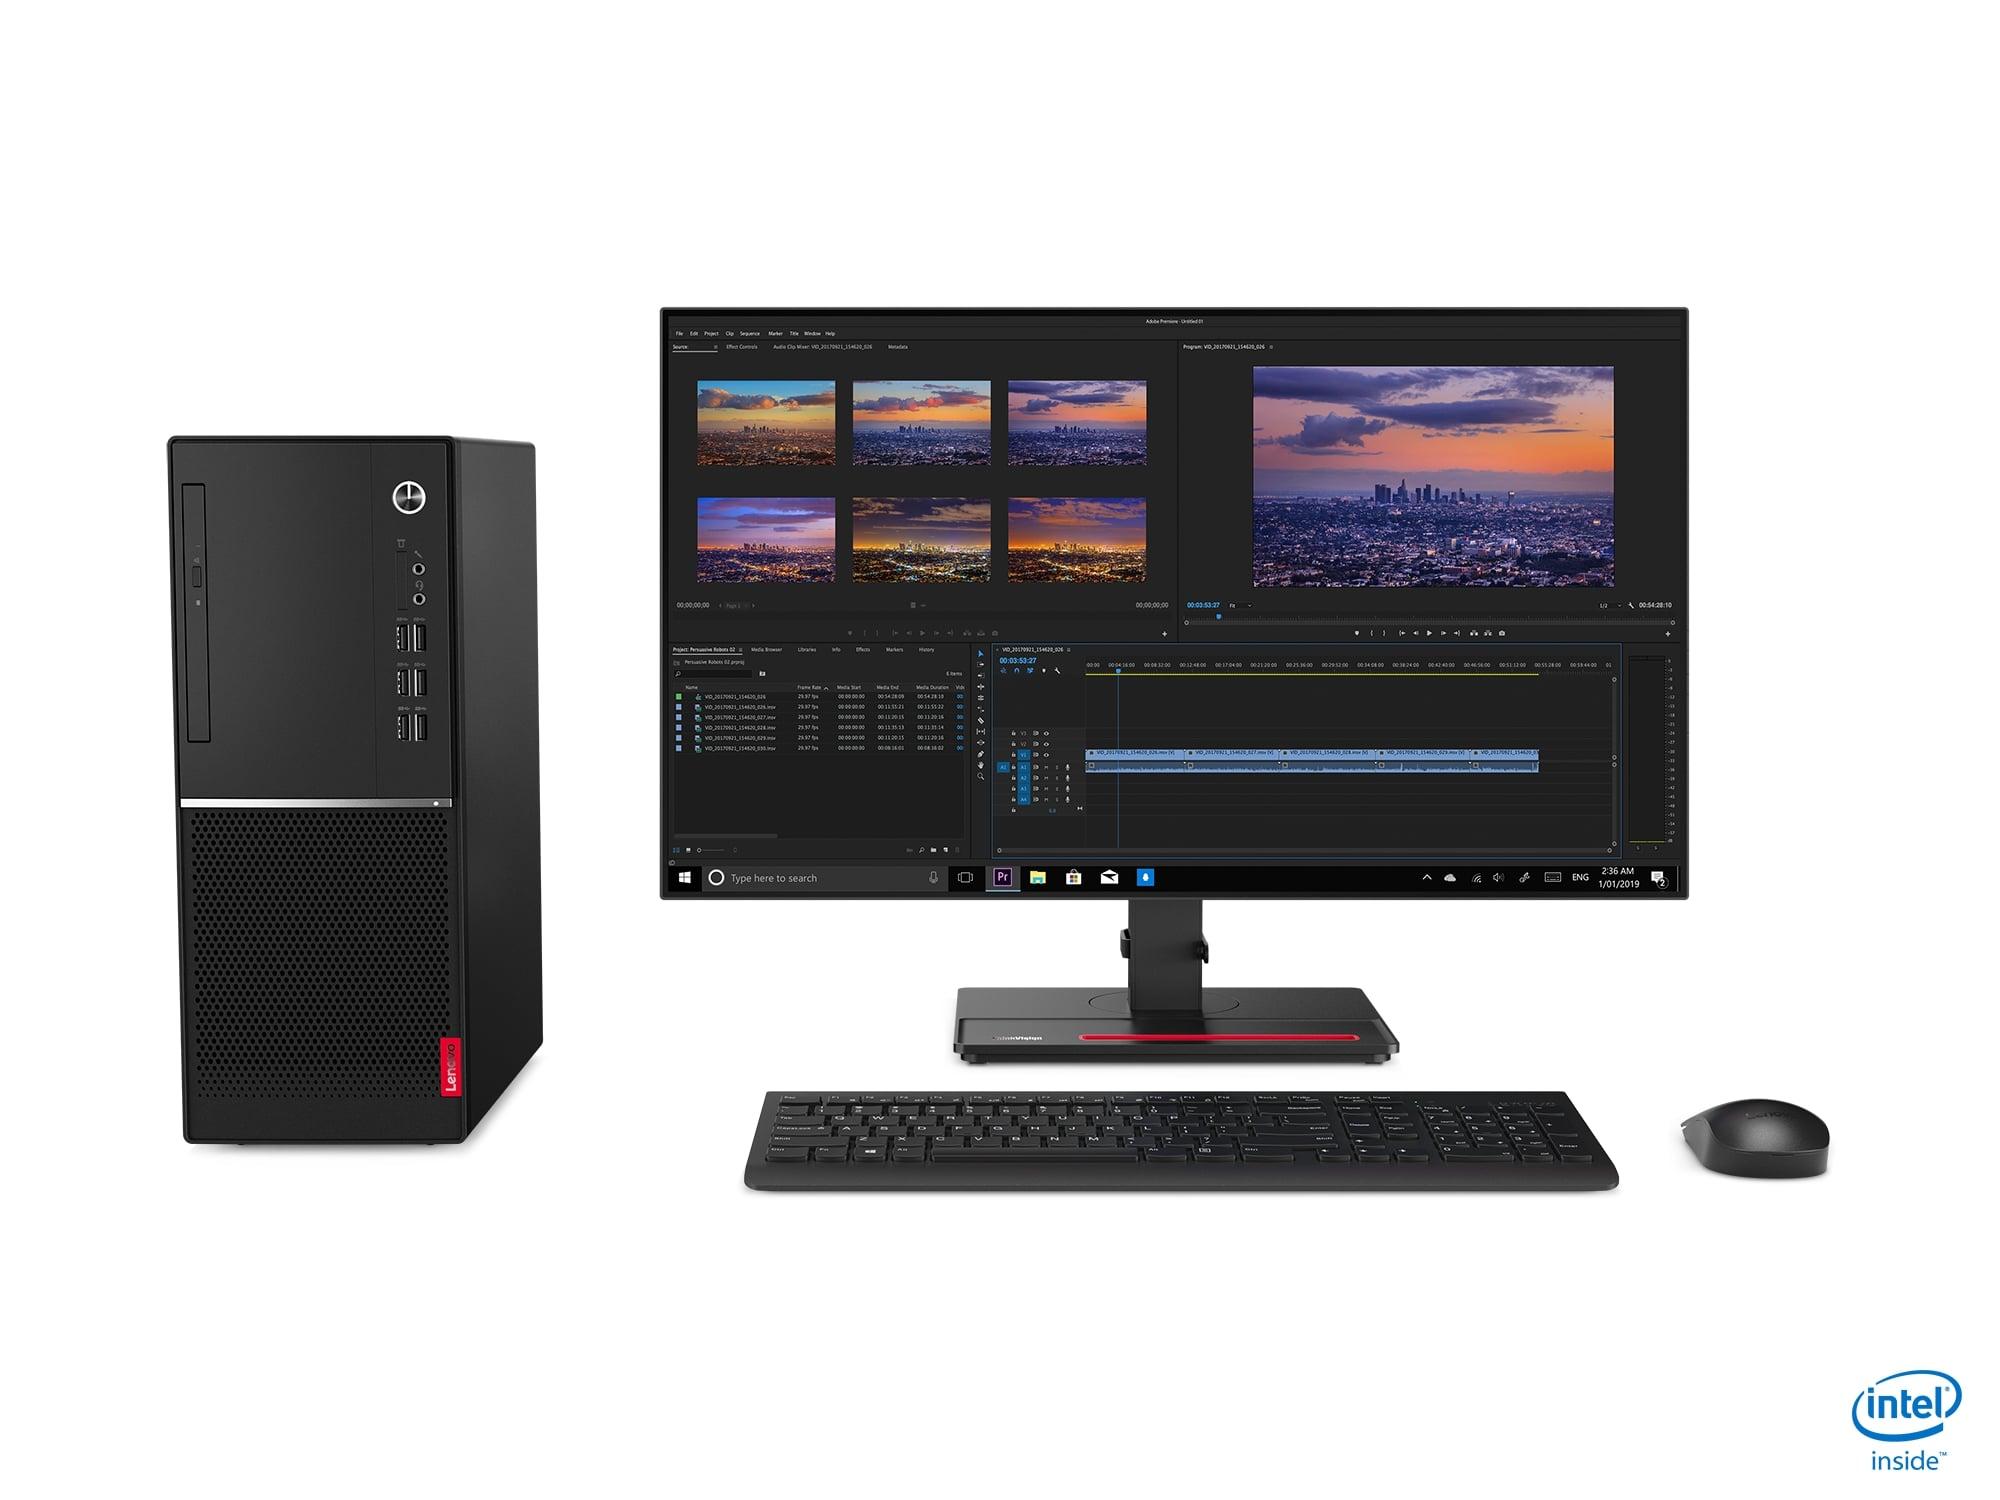 Lenovo V530 TWR/i3-9100/1T/4GB/HD/DVD/W10P